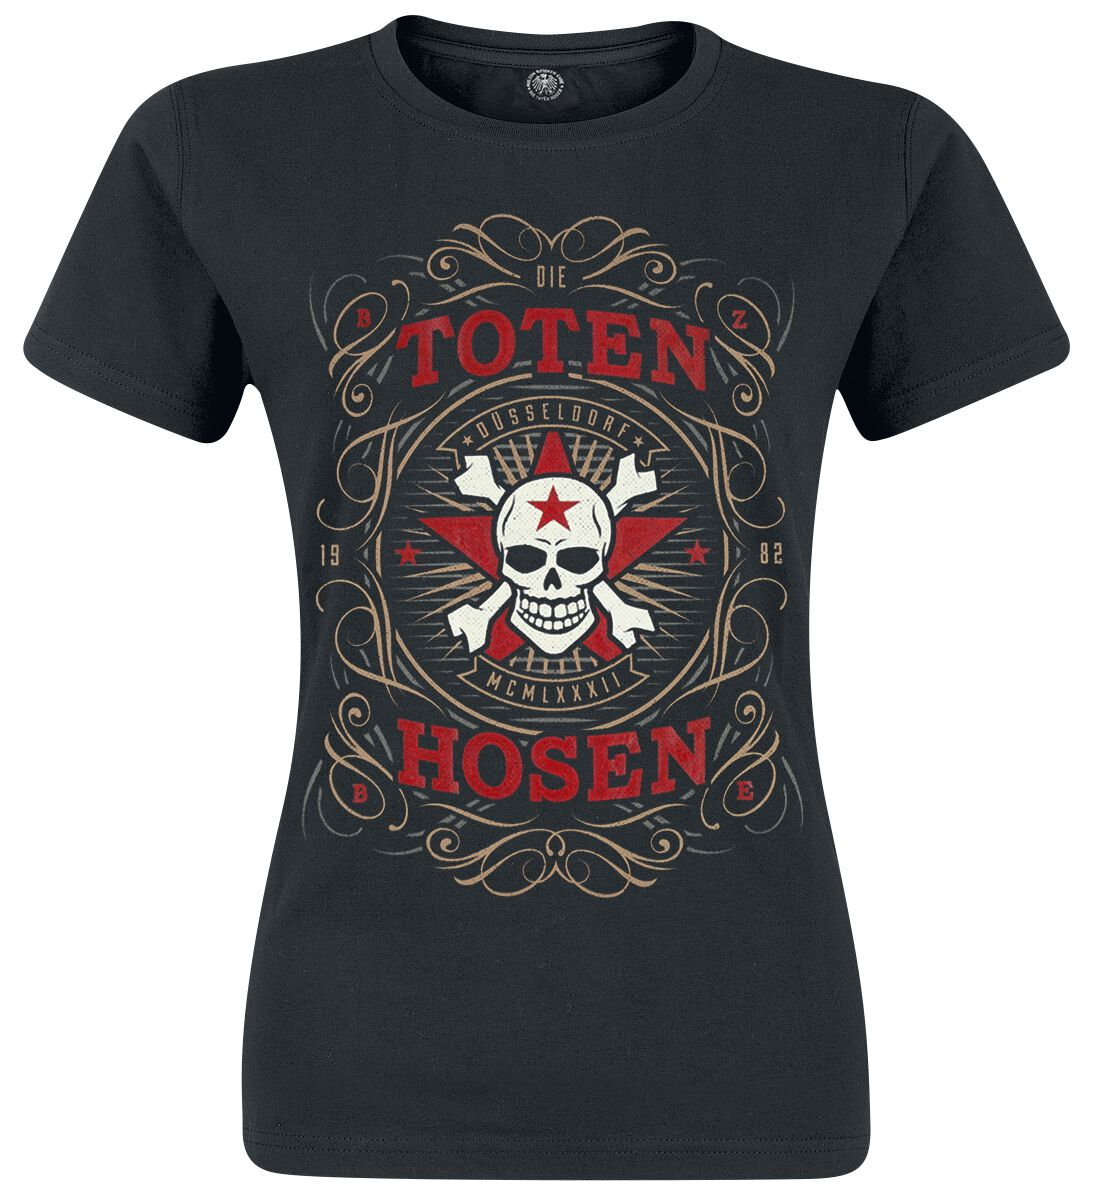 Die Toten Hosen Düsseldorf MCMLXXXII Koszulka damska czarny